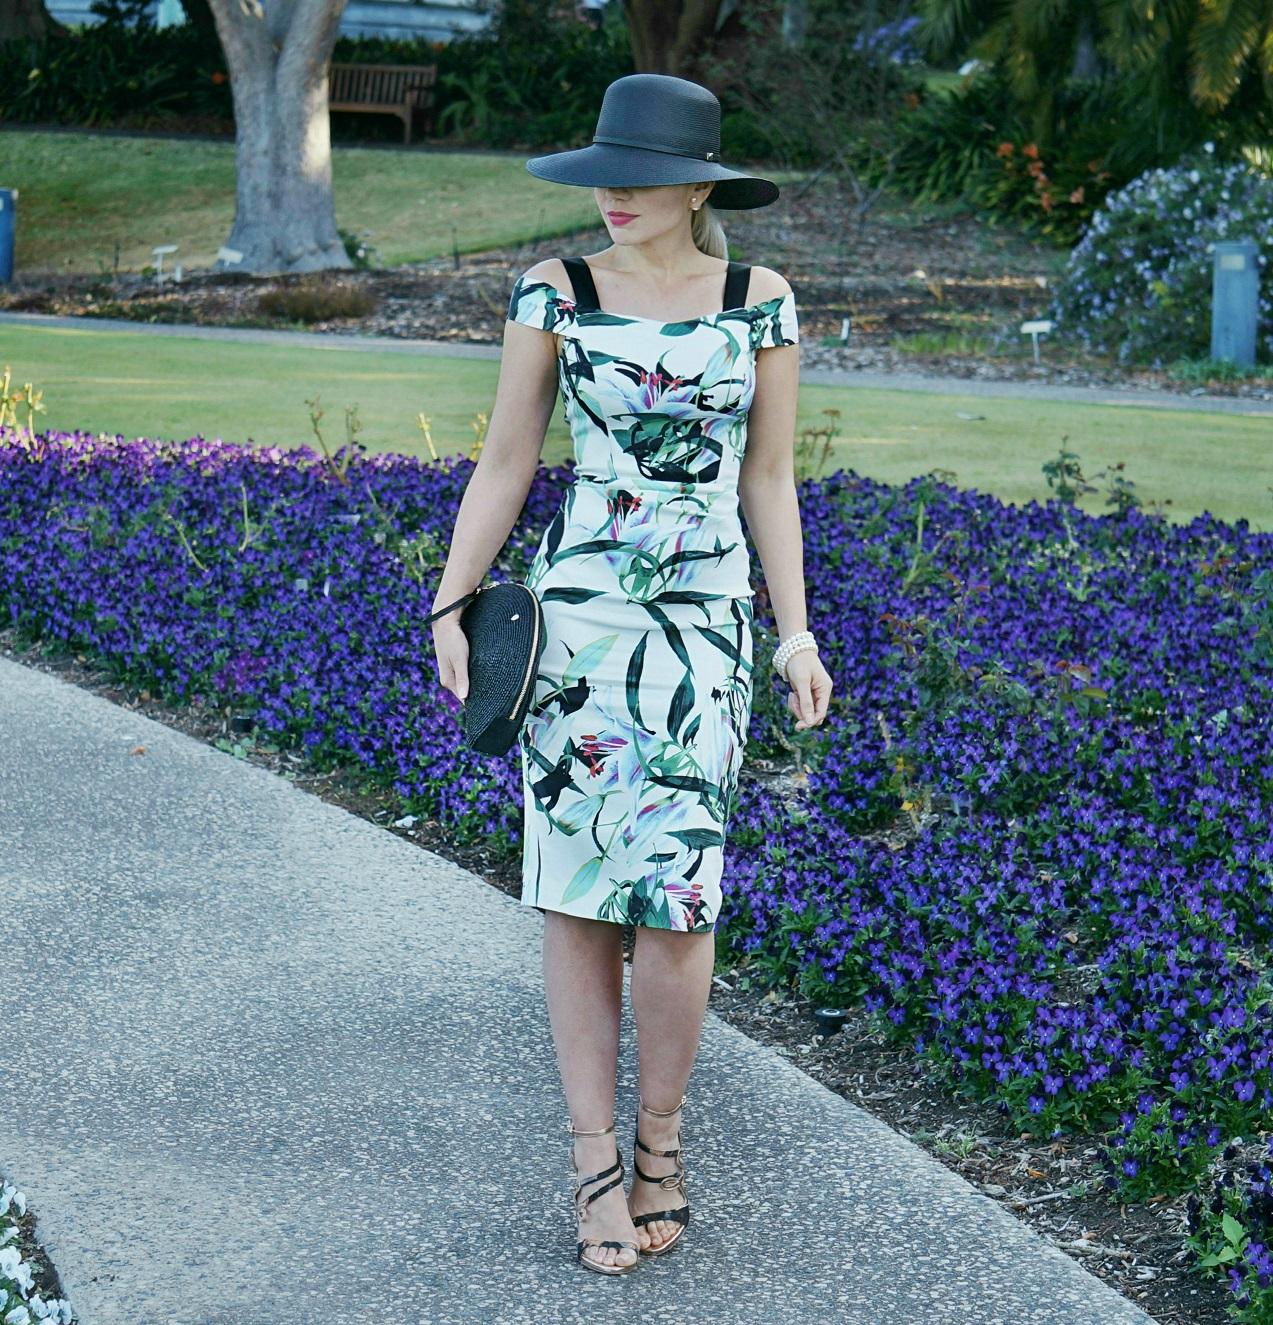 Spring racing fashion